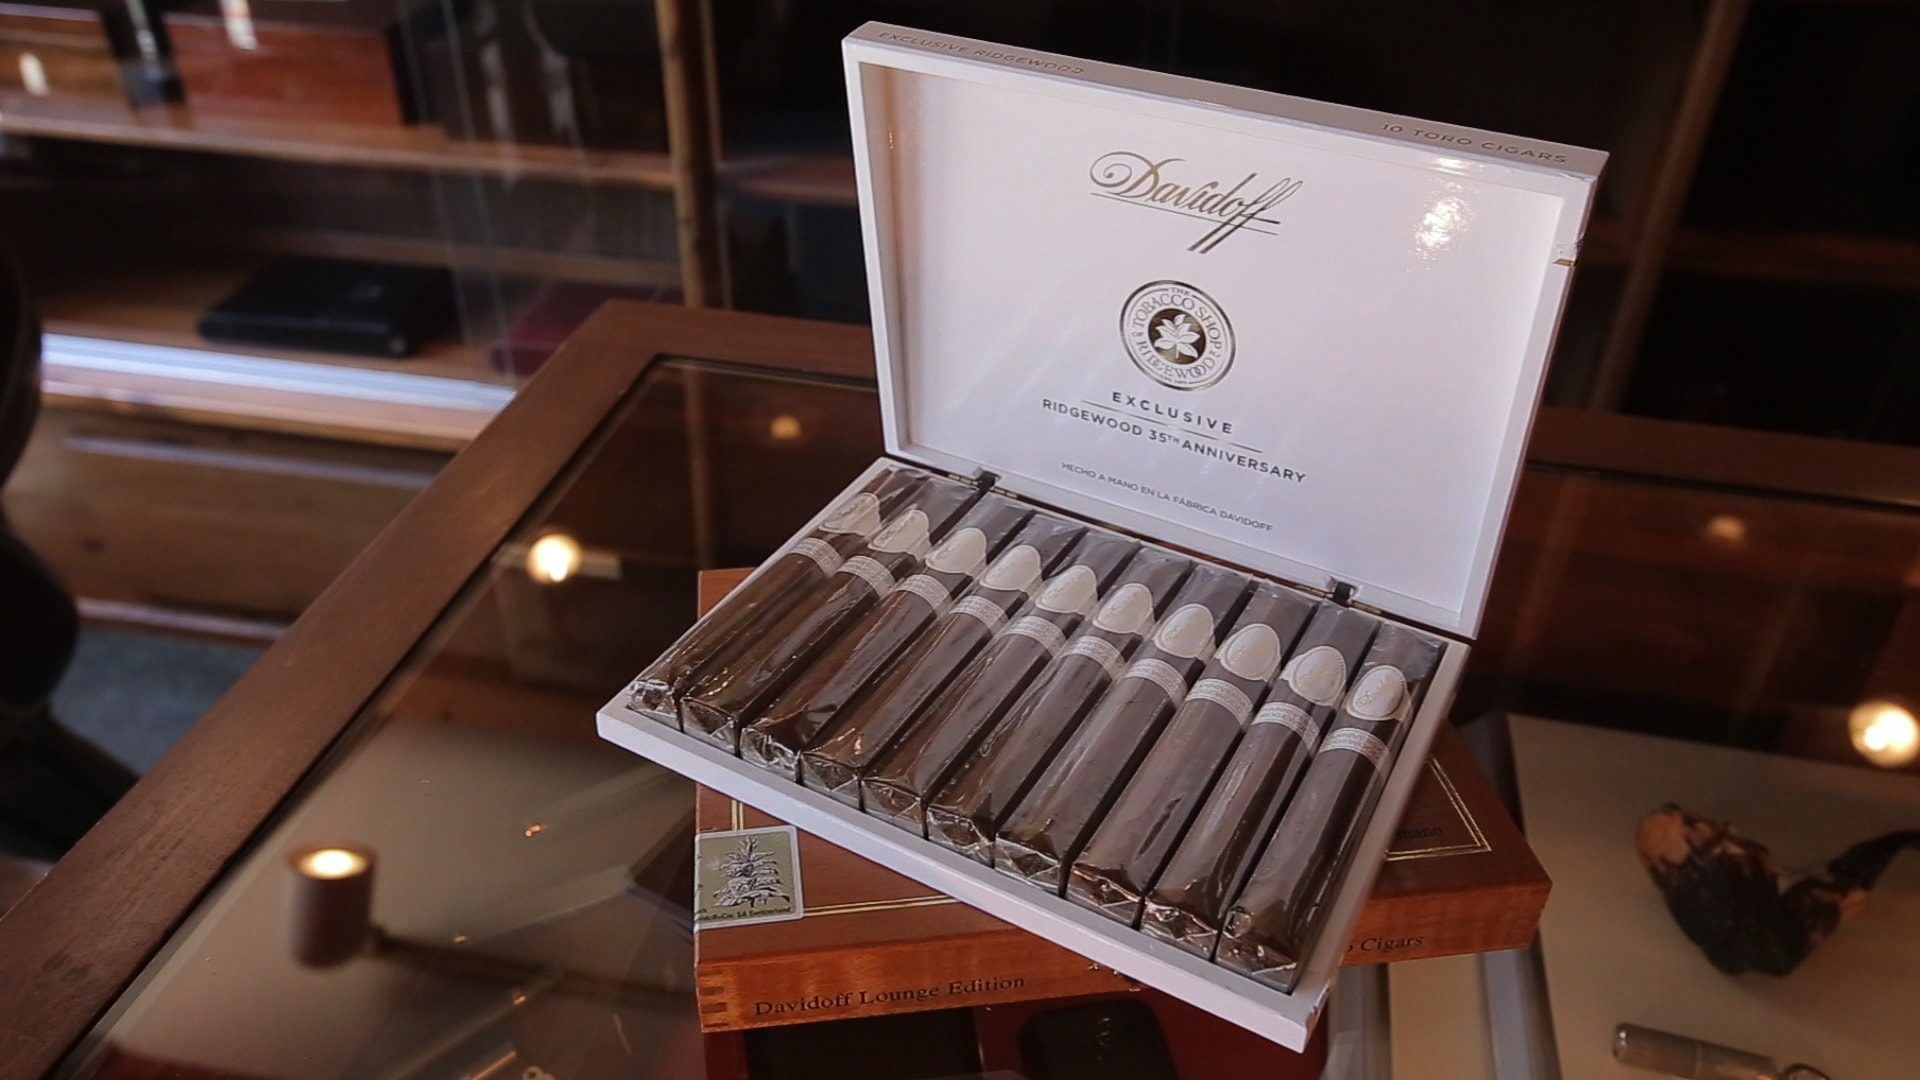 Davidoff Cigar Lounge - The Tobacco Shop of Ridgewood-min.jpg